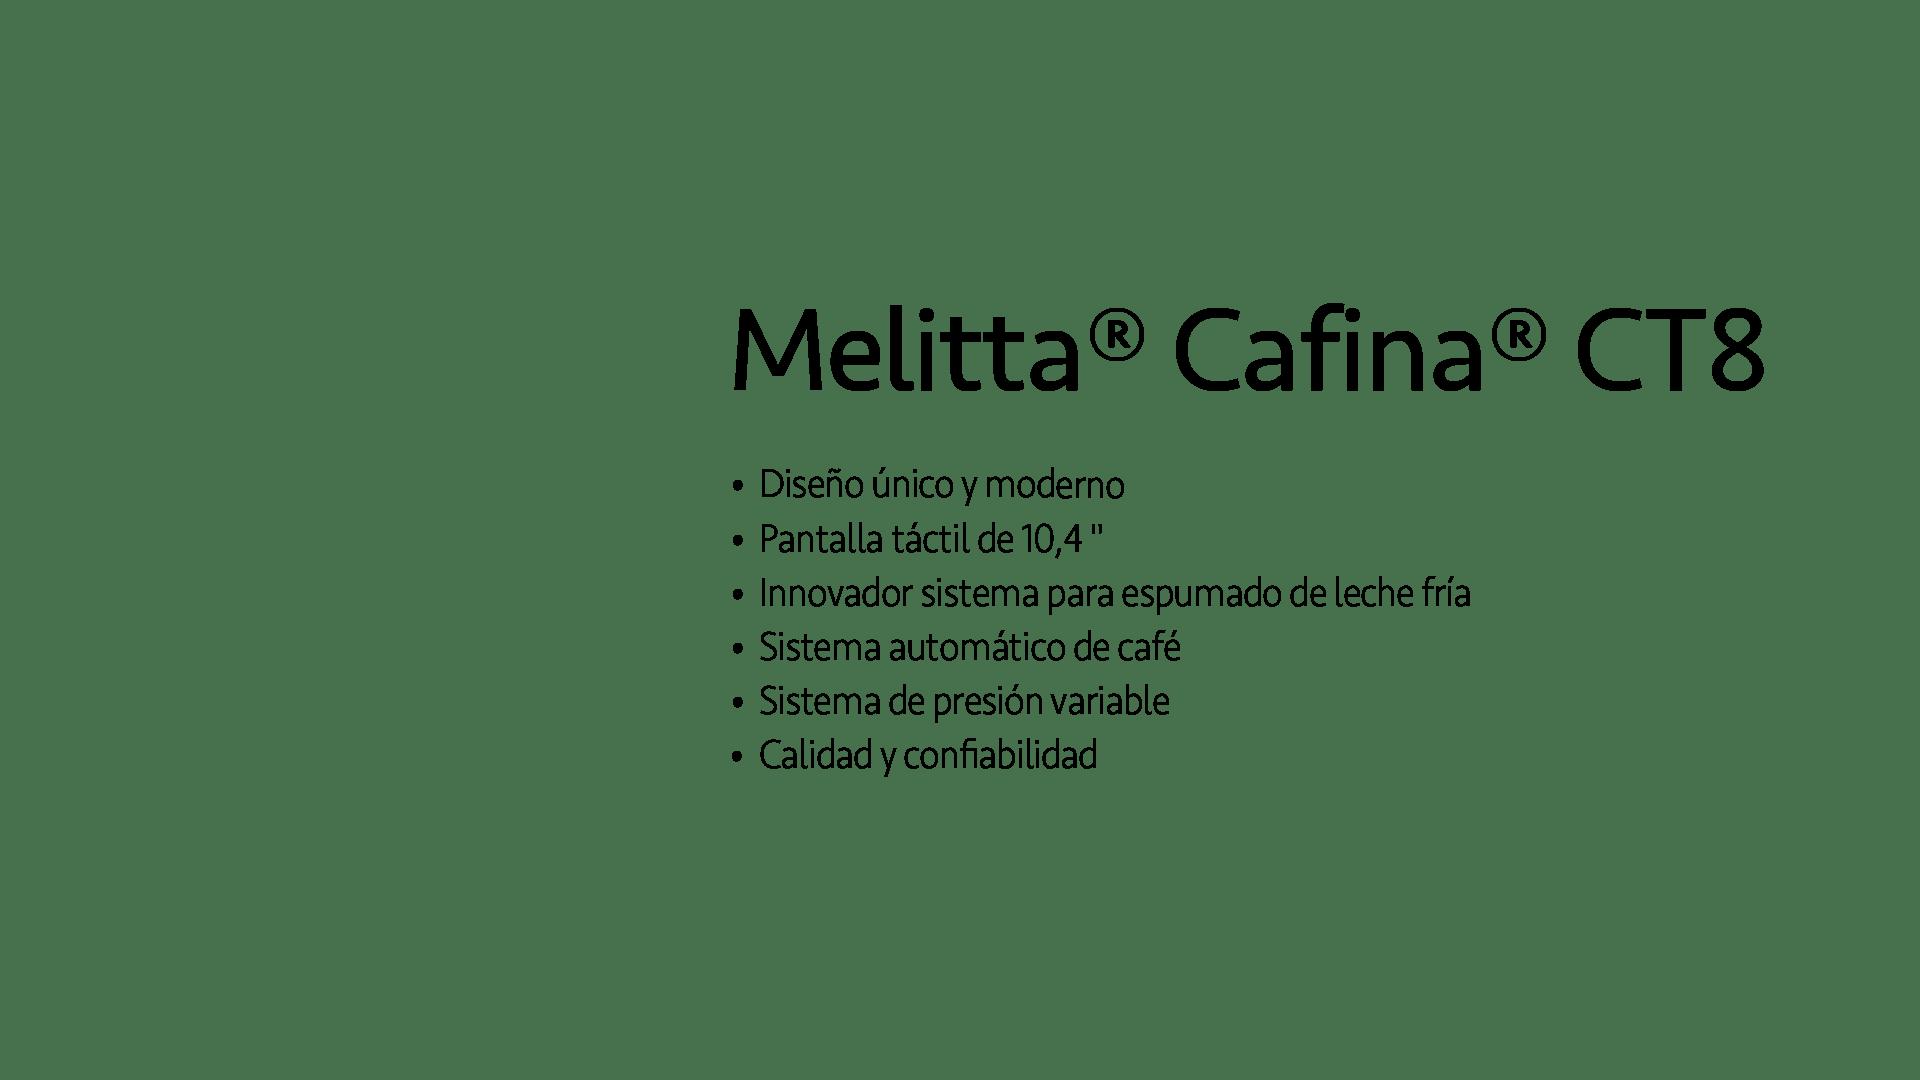 Máquinas de espresso súper automáticas Melitta CT8 Titulo